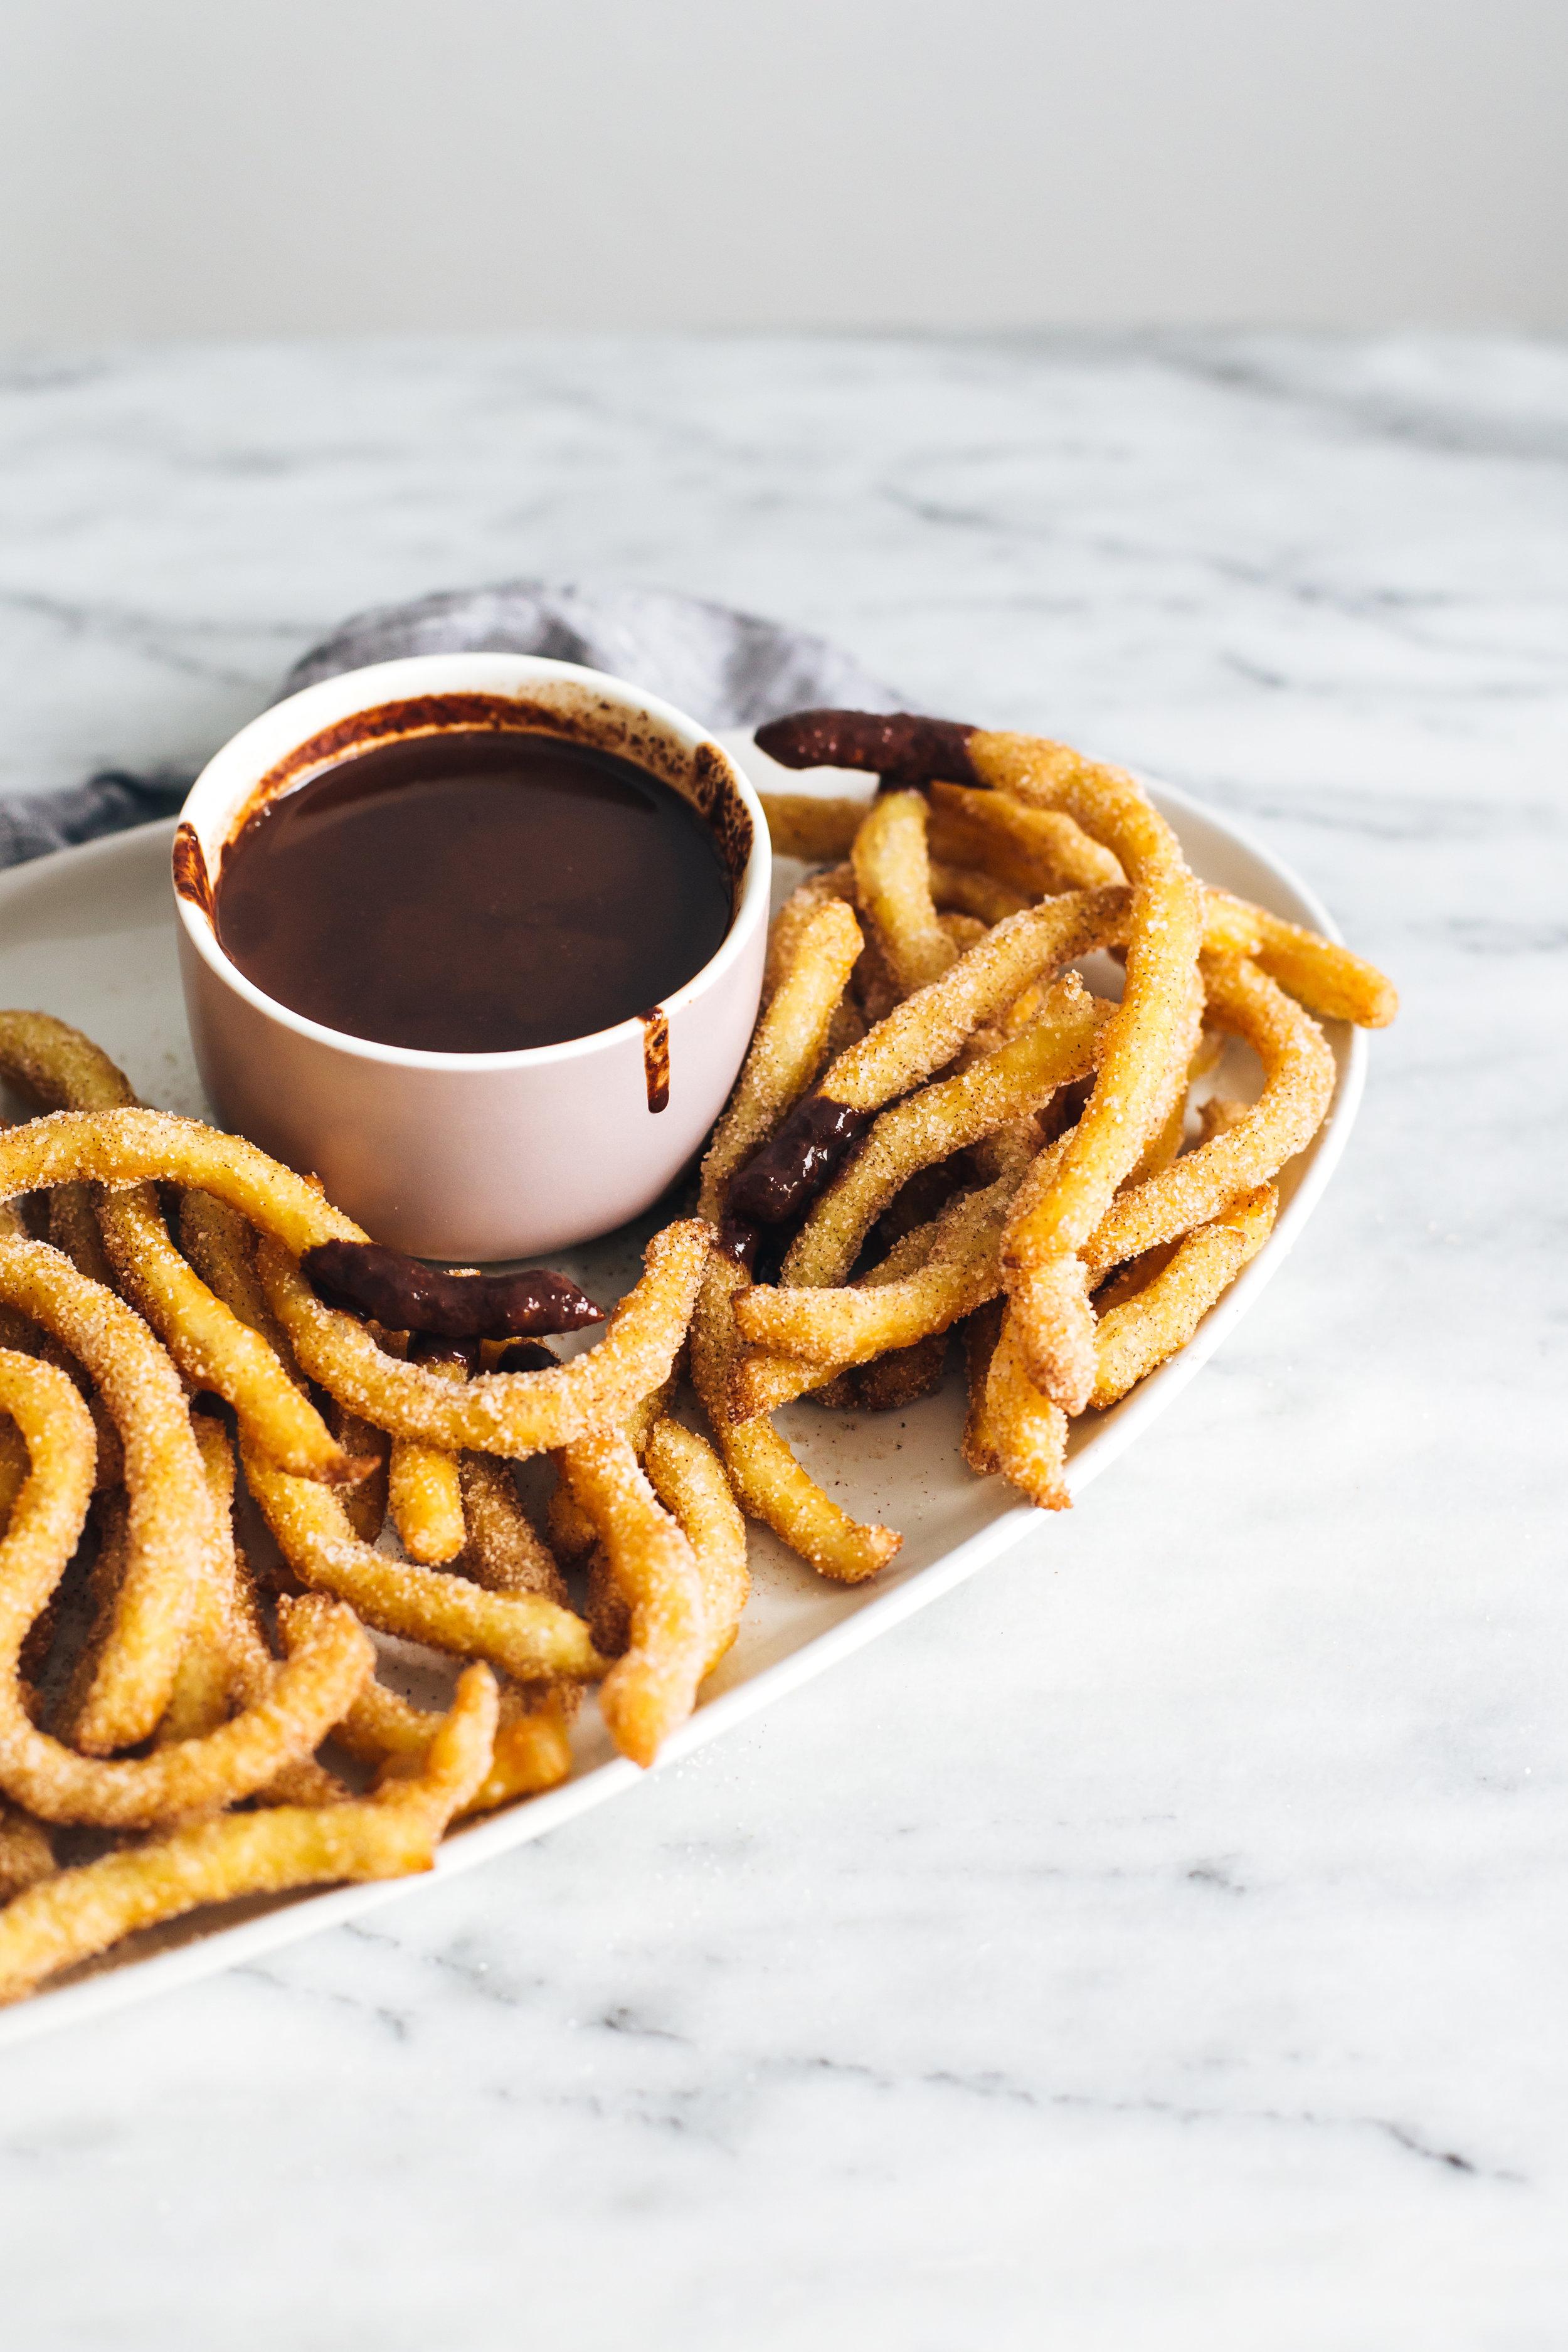 churro_fries_spicy_chocolate_dip-10.jpg